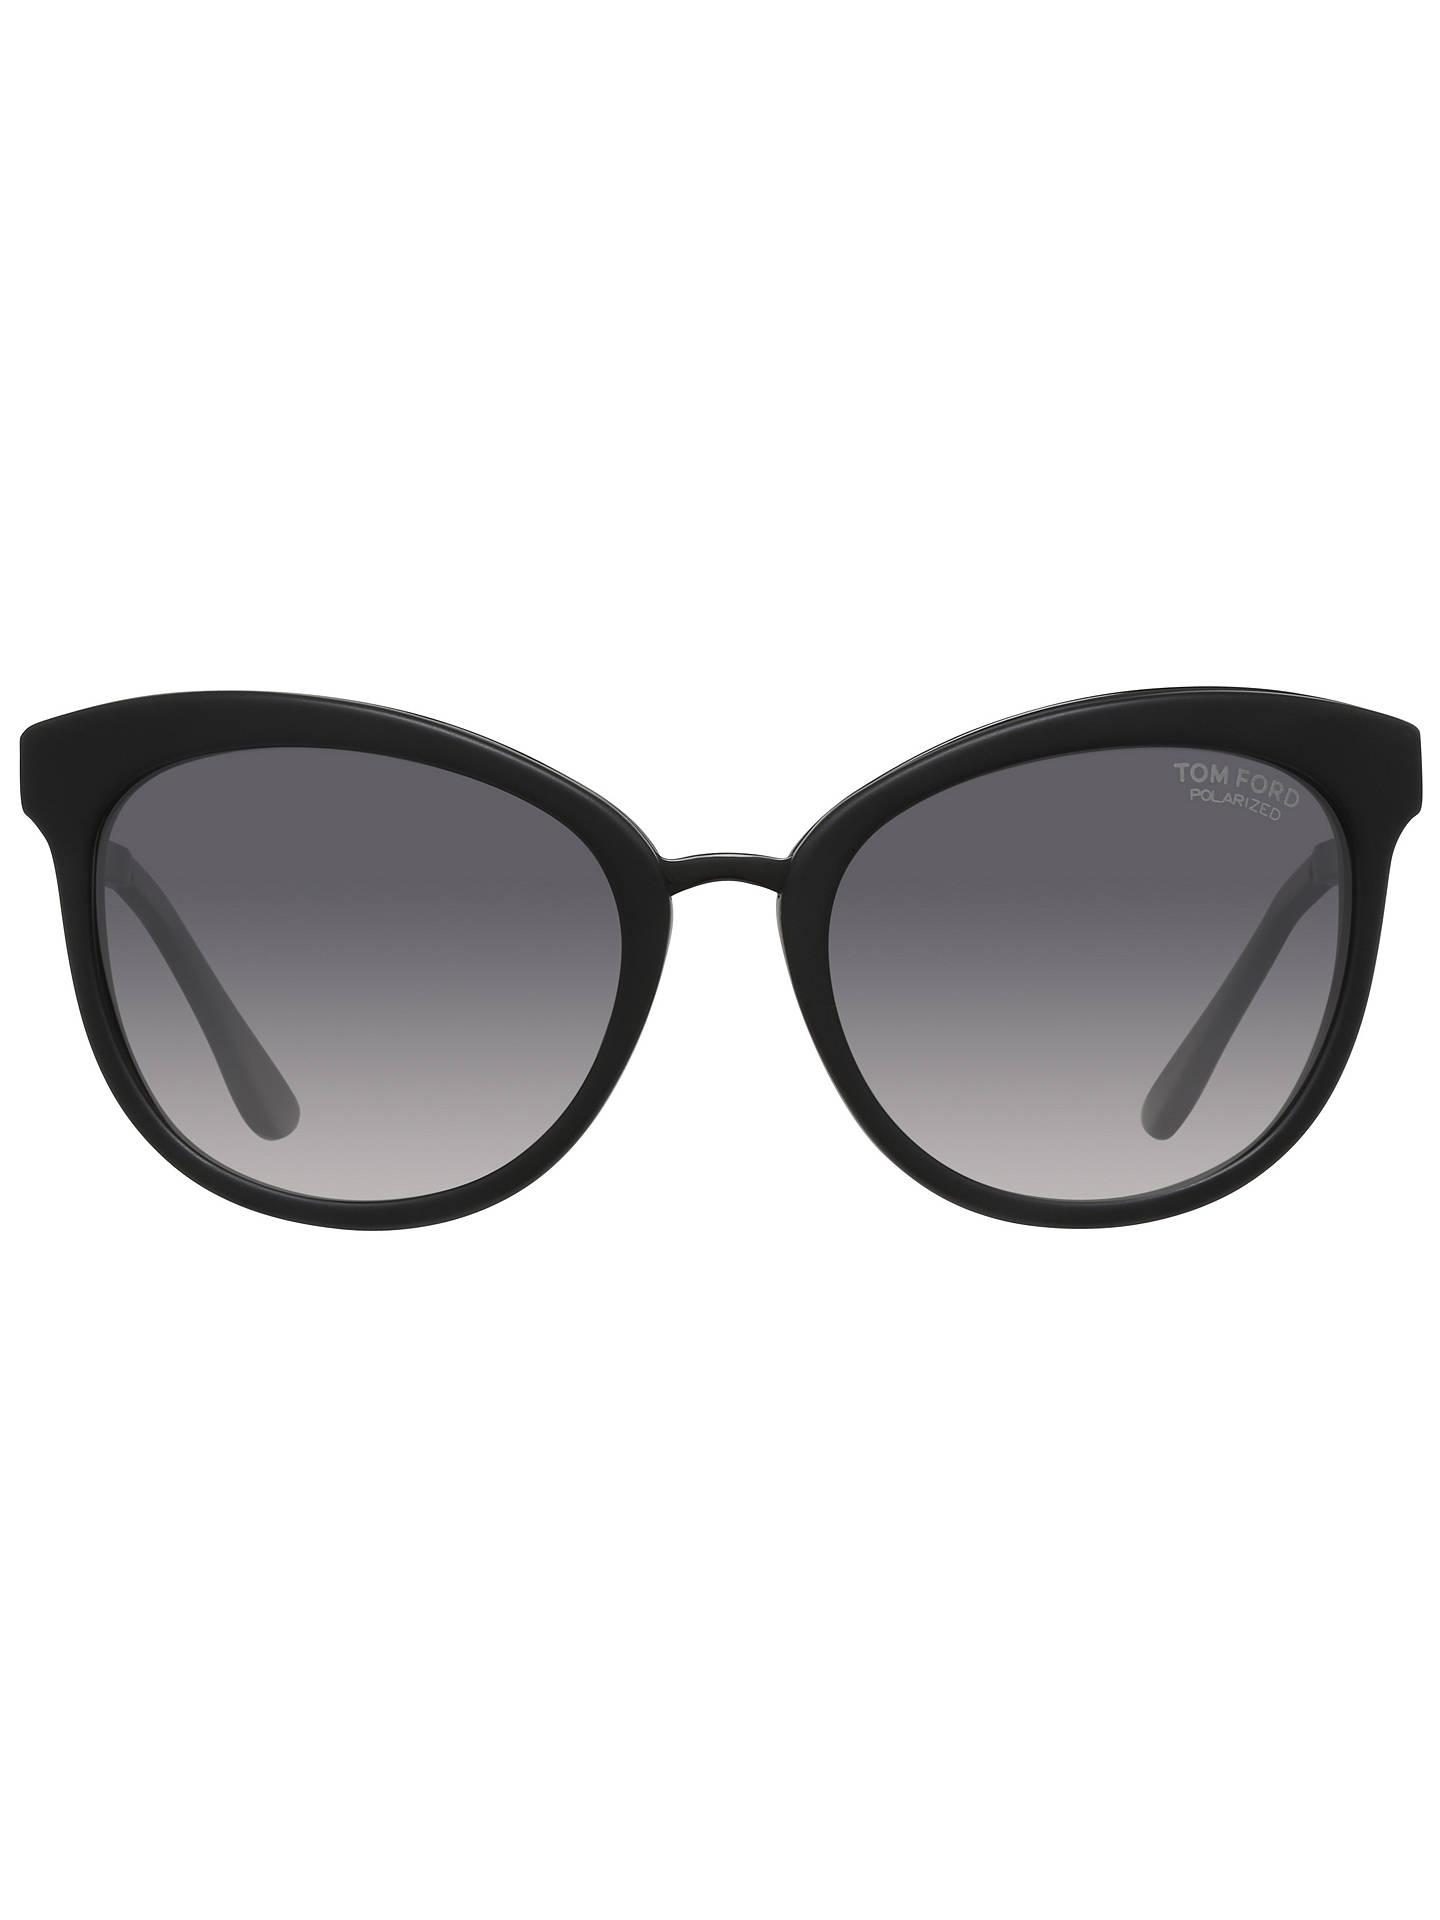 852cb17845 ... Buy TOM FORD FT0461 Emma Polarised Cat s Eye Sunglasses